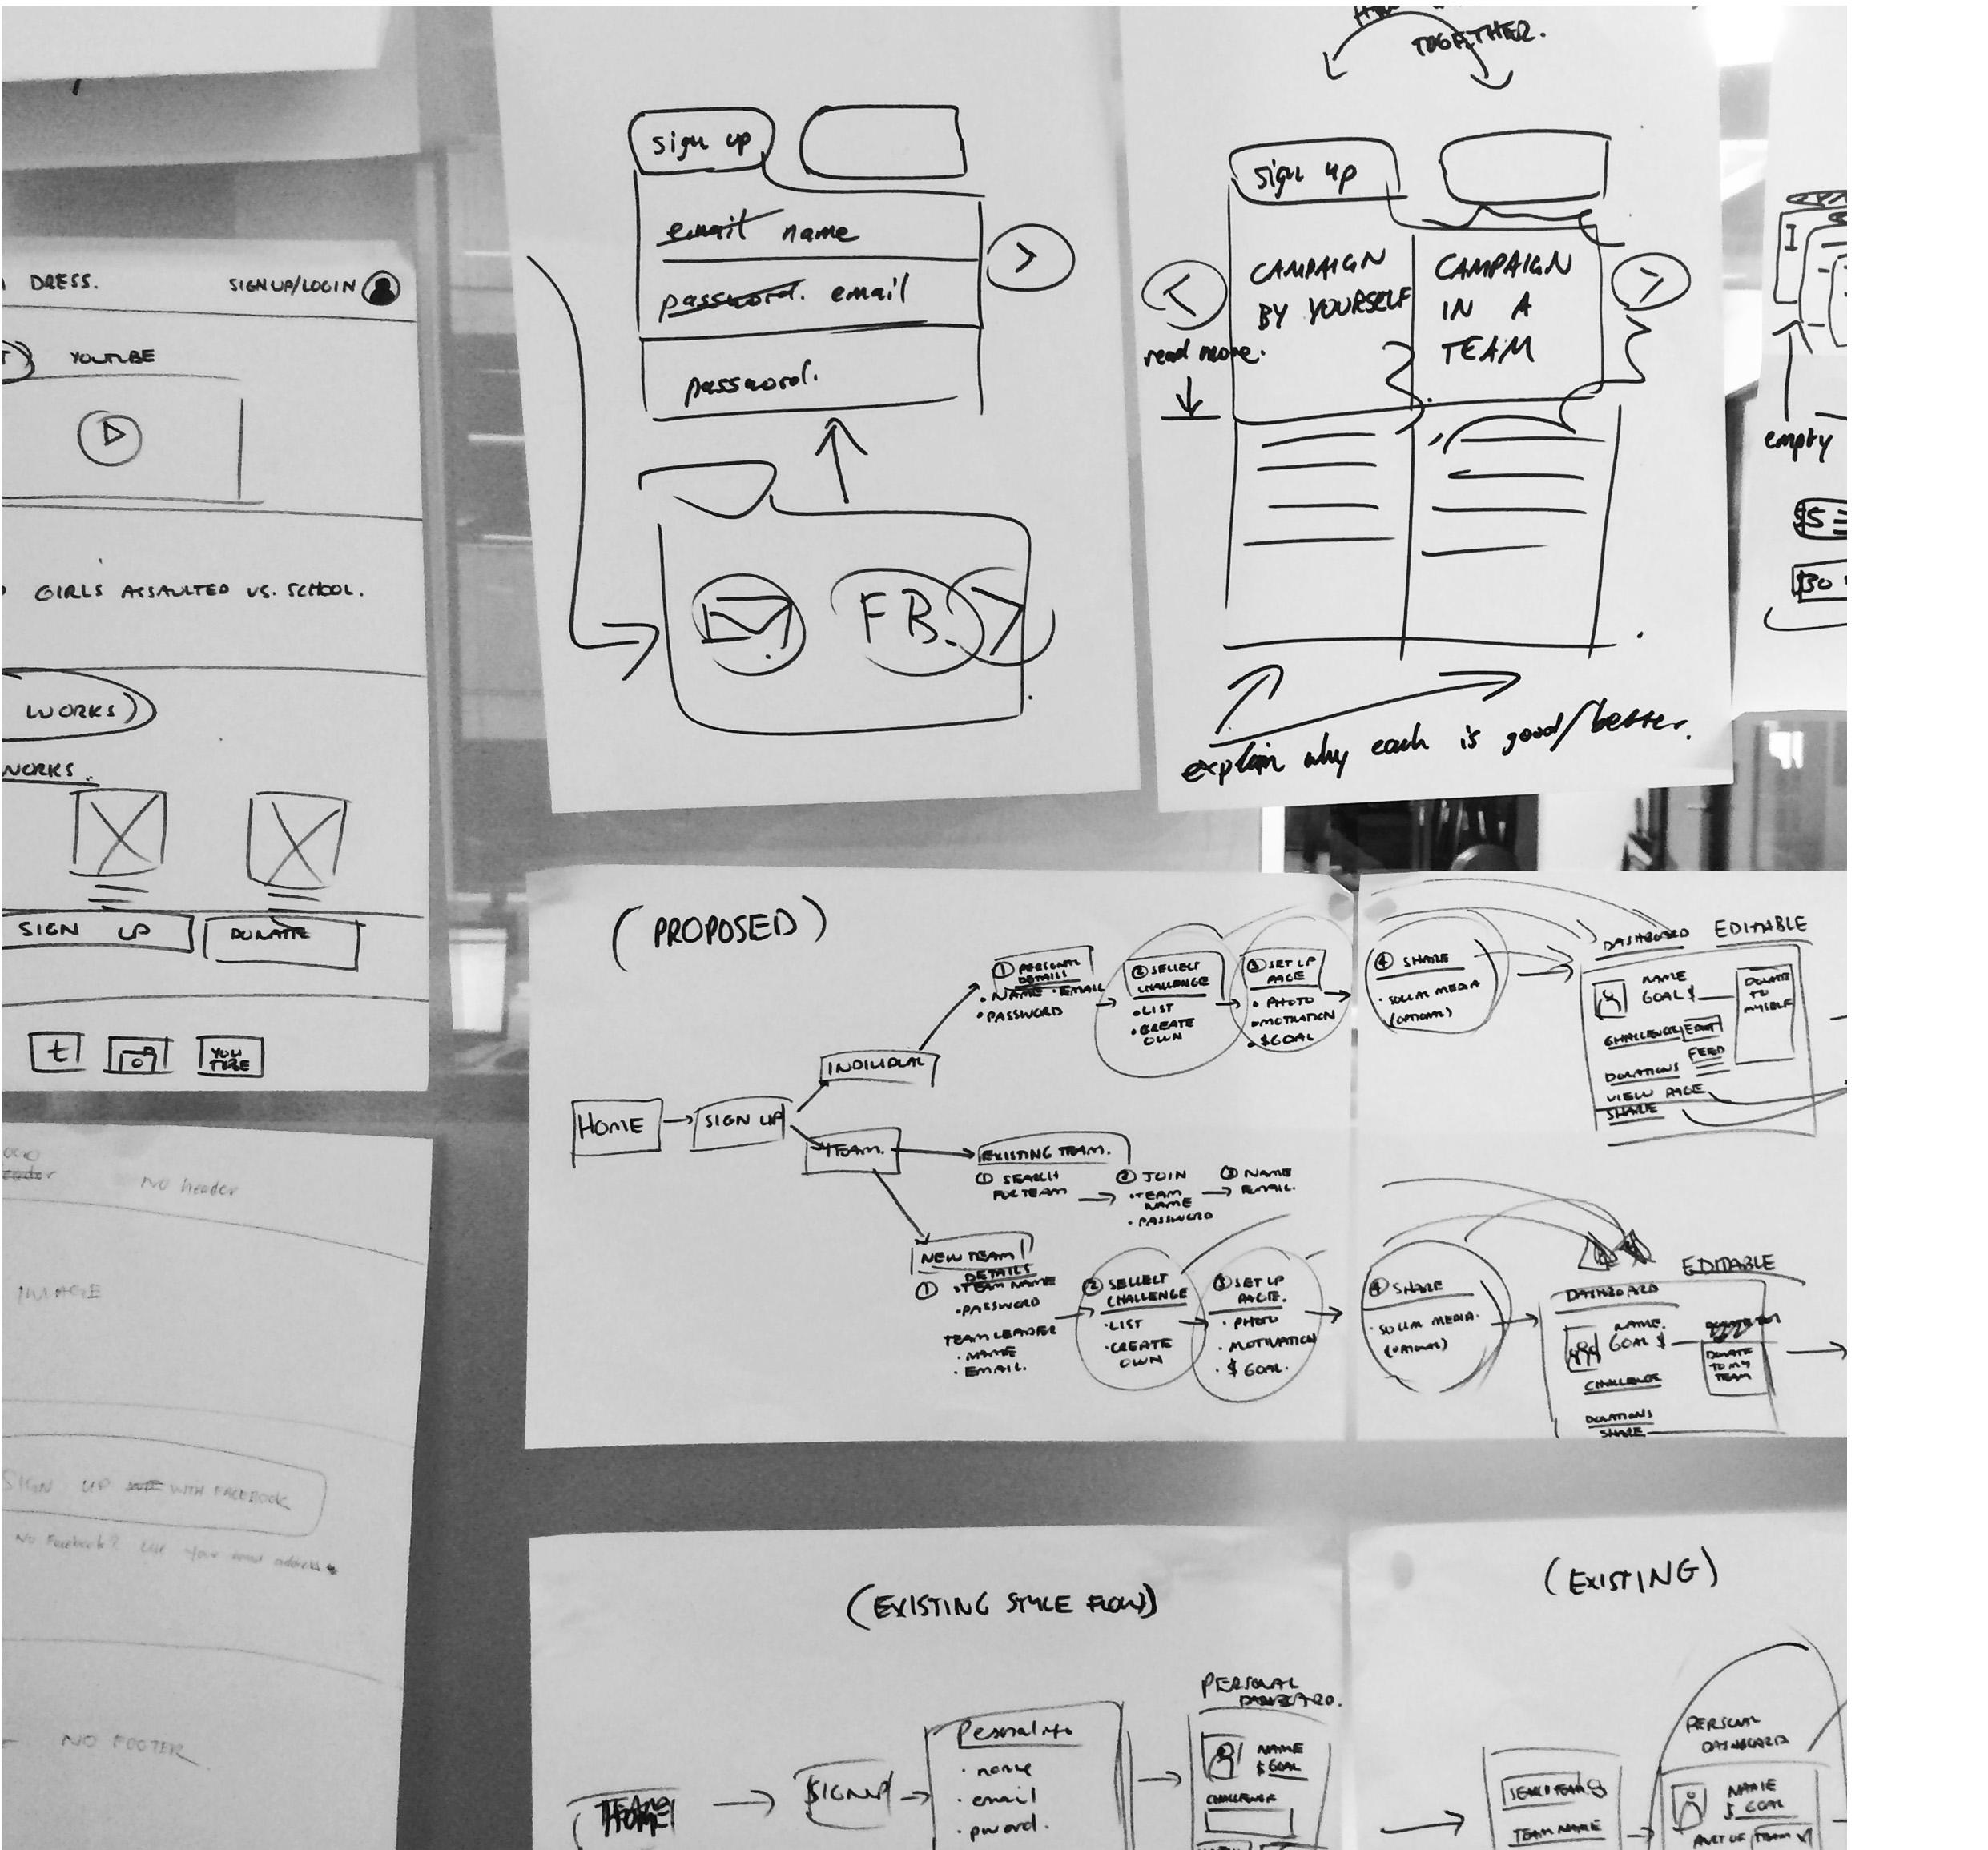 Rough sketches, wireframes & flowsto explore ideas